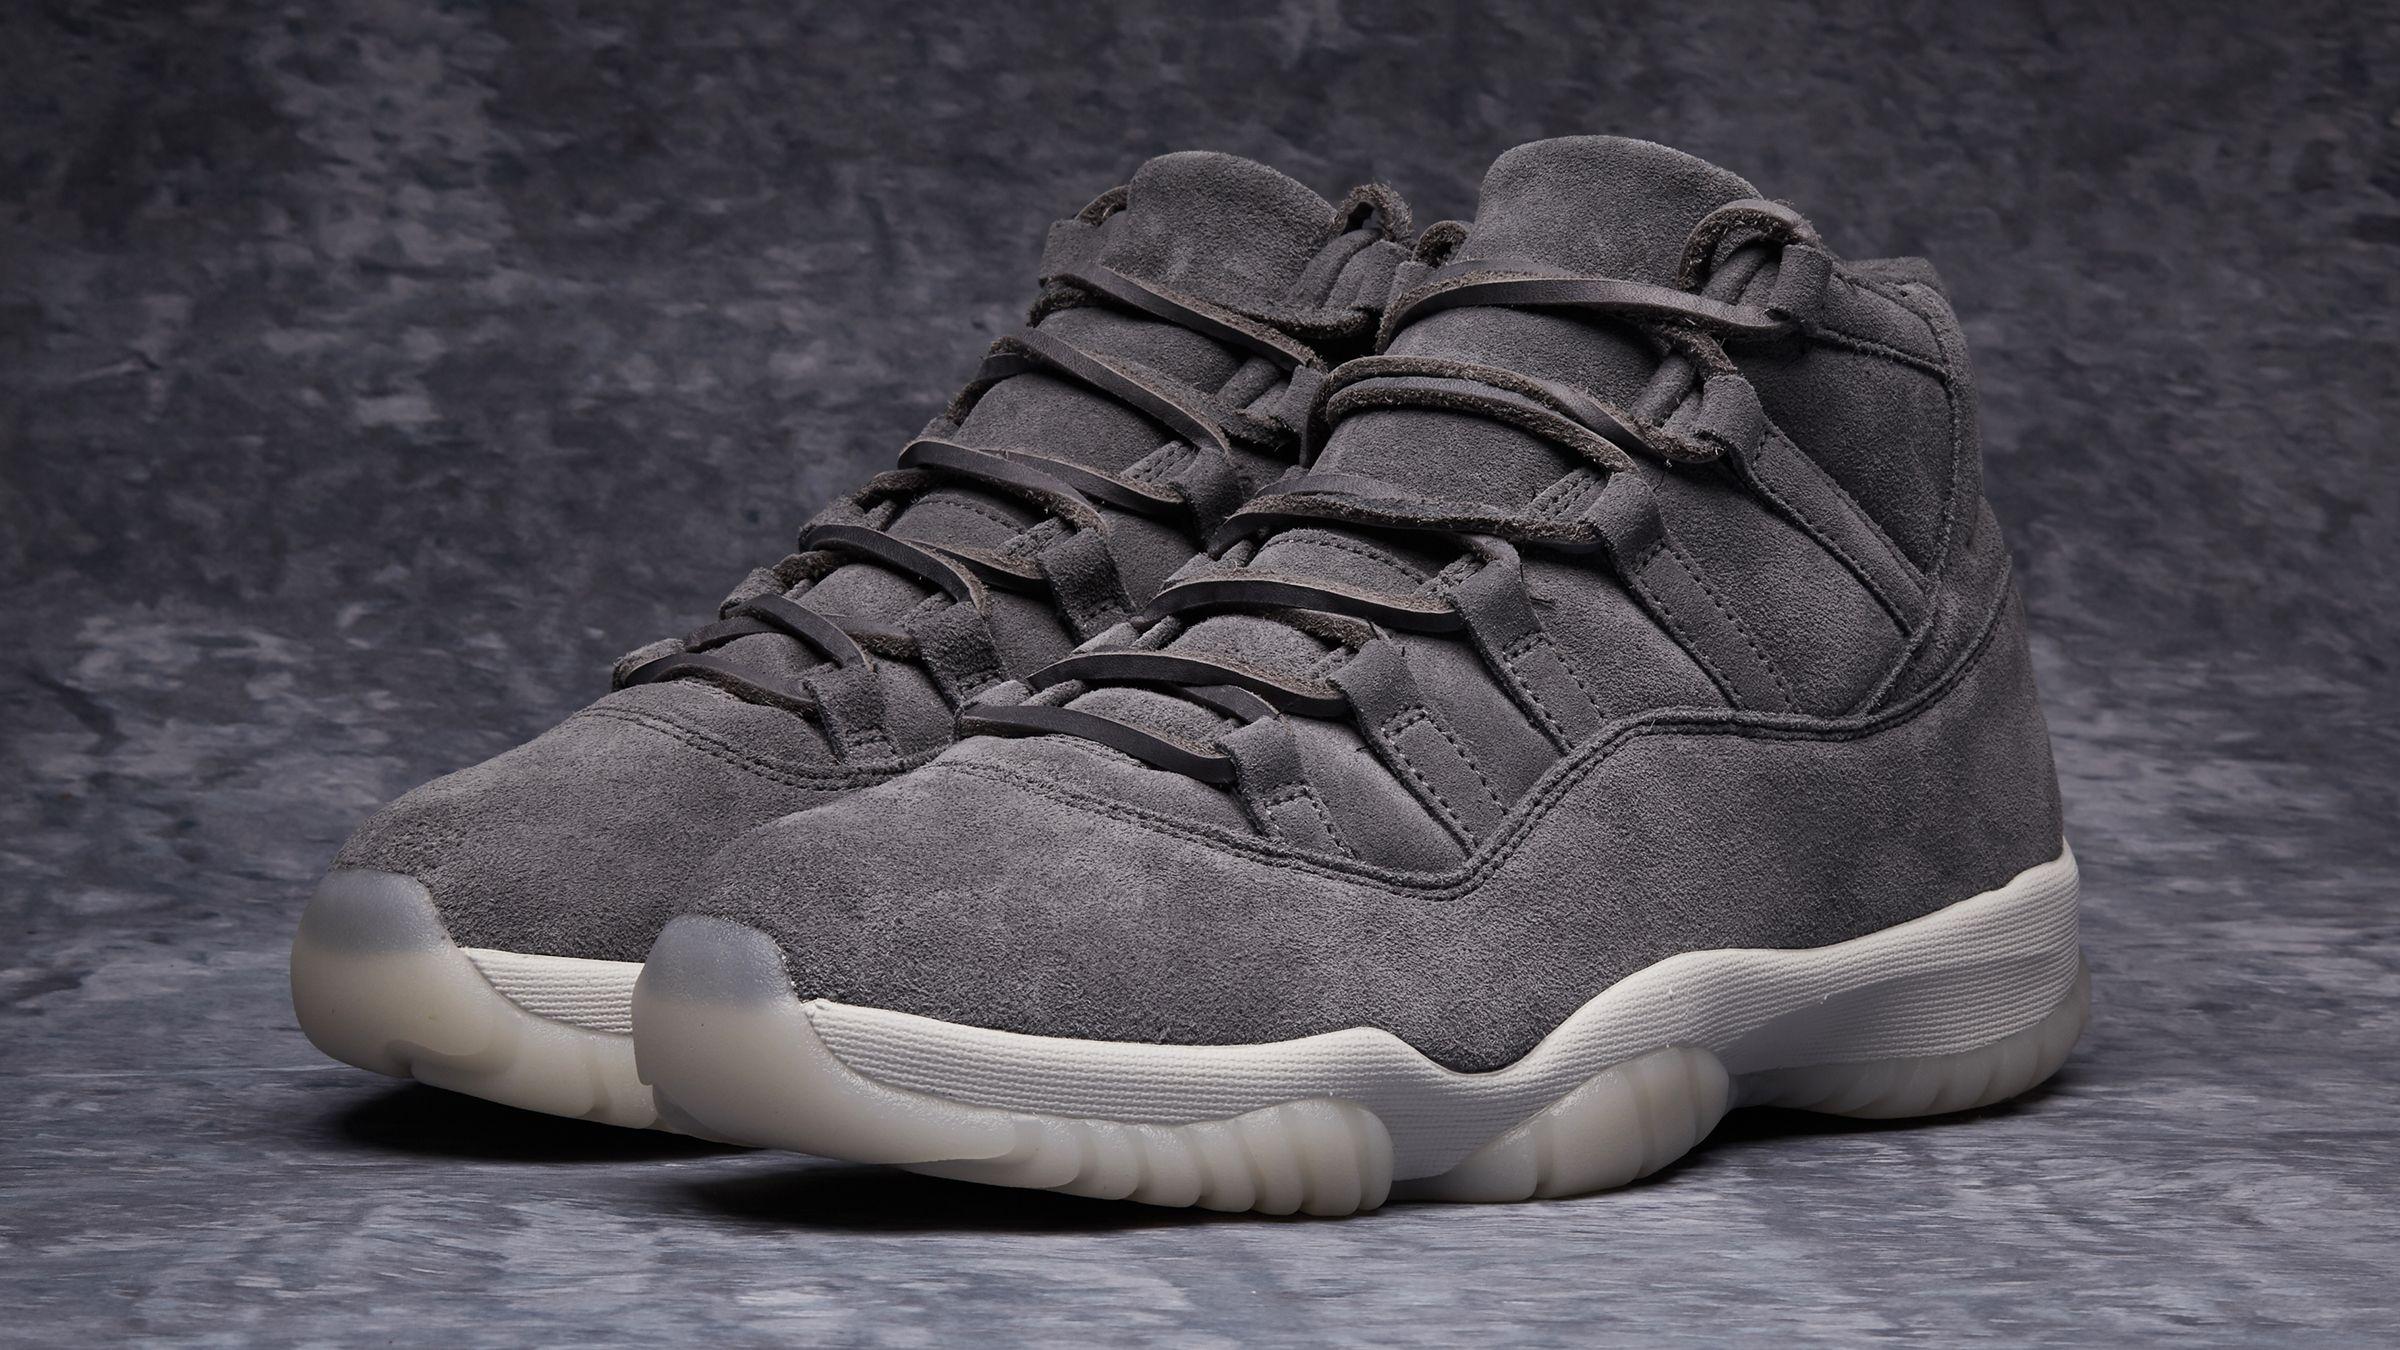 reputable site 3397e 3f39f Air Jordan 11 Premium « Cool Grey » Credit   End Clothing  Nike  Inside